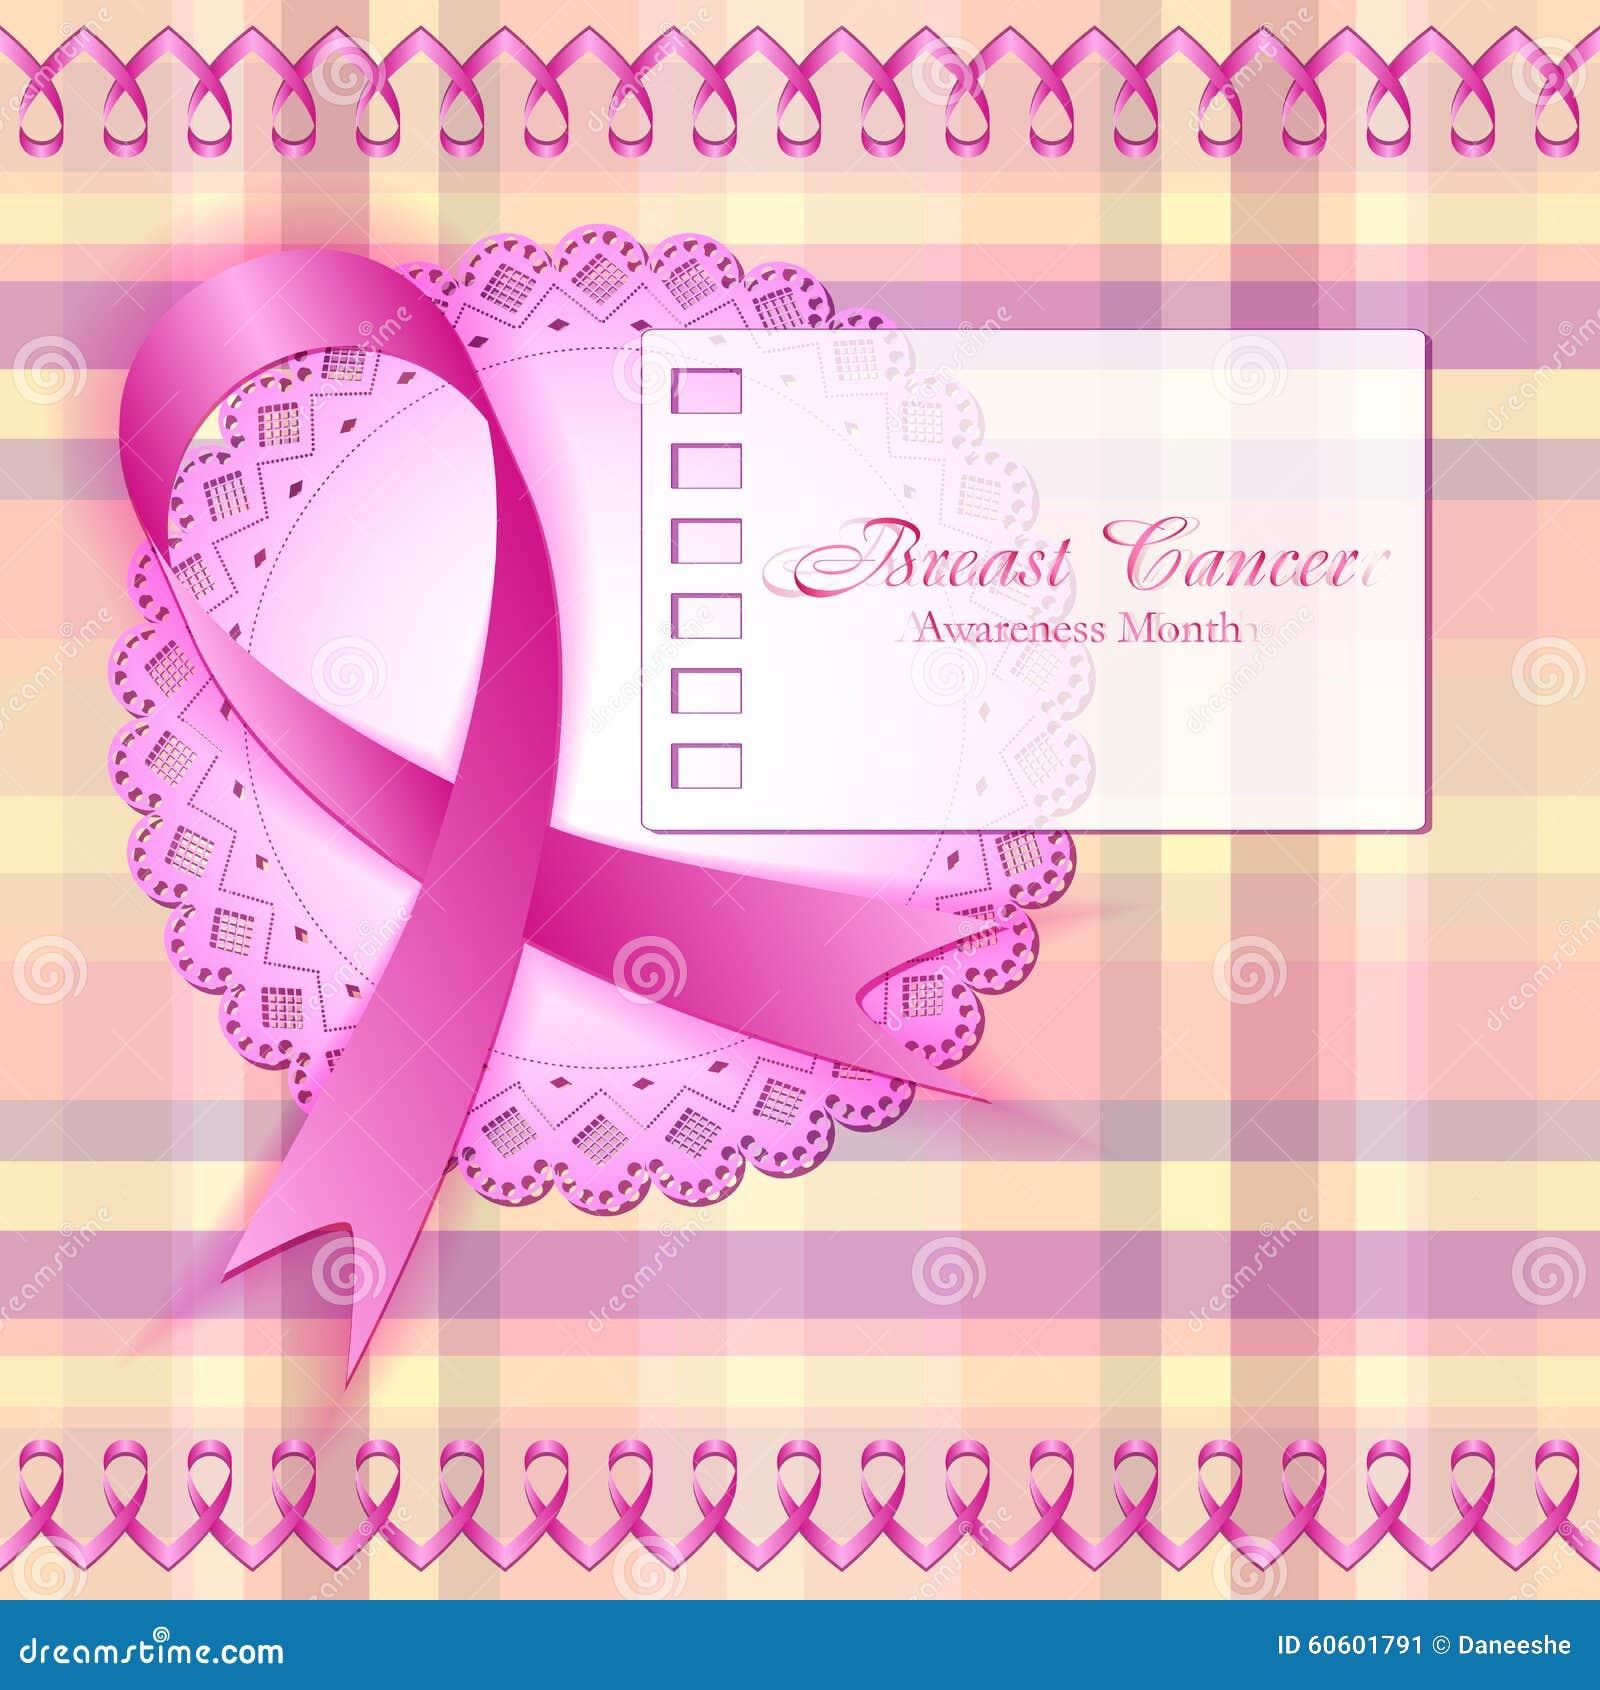 cute breast cancer awareness - photo #6